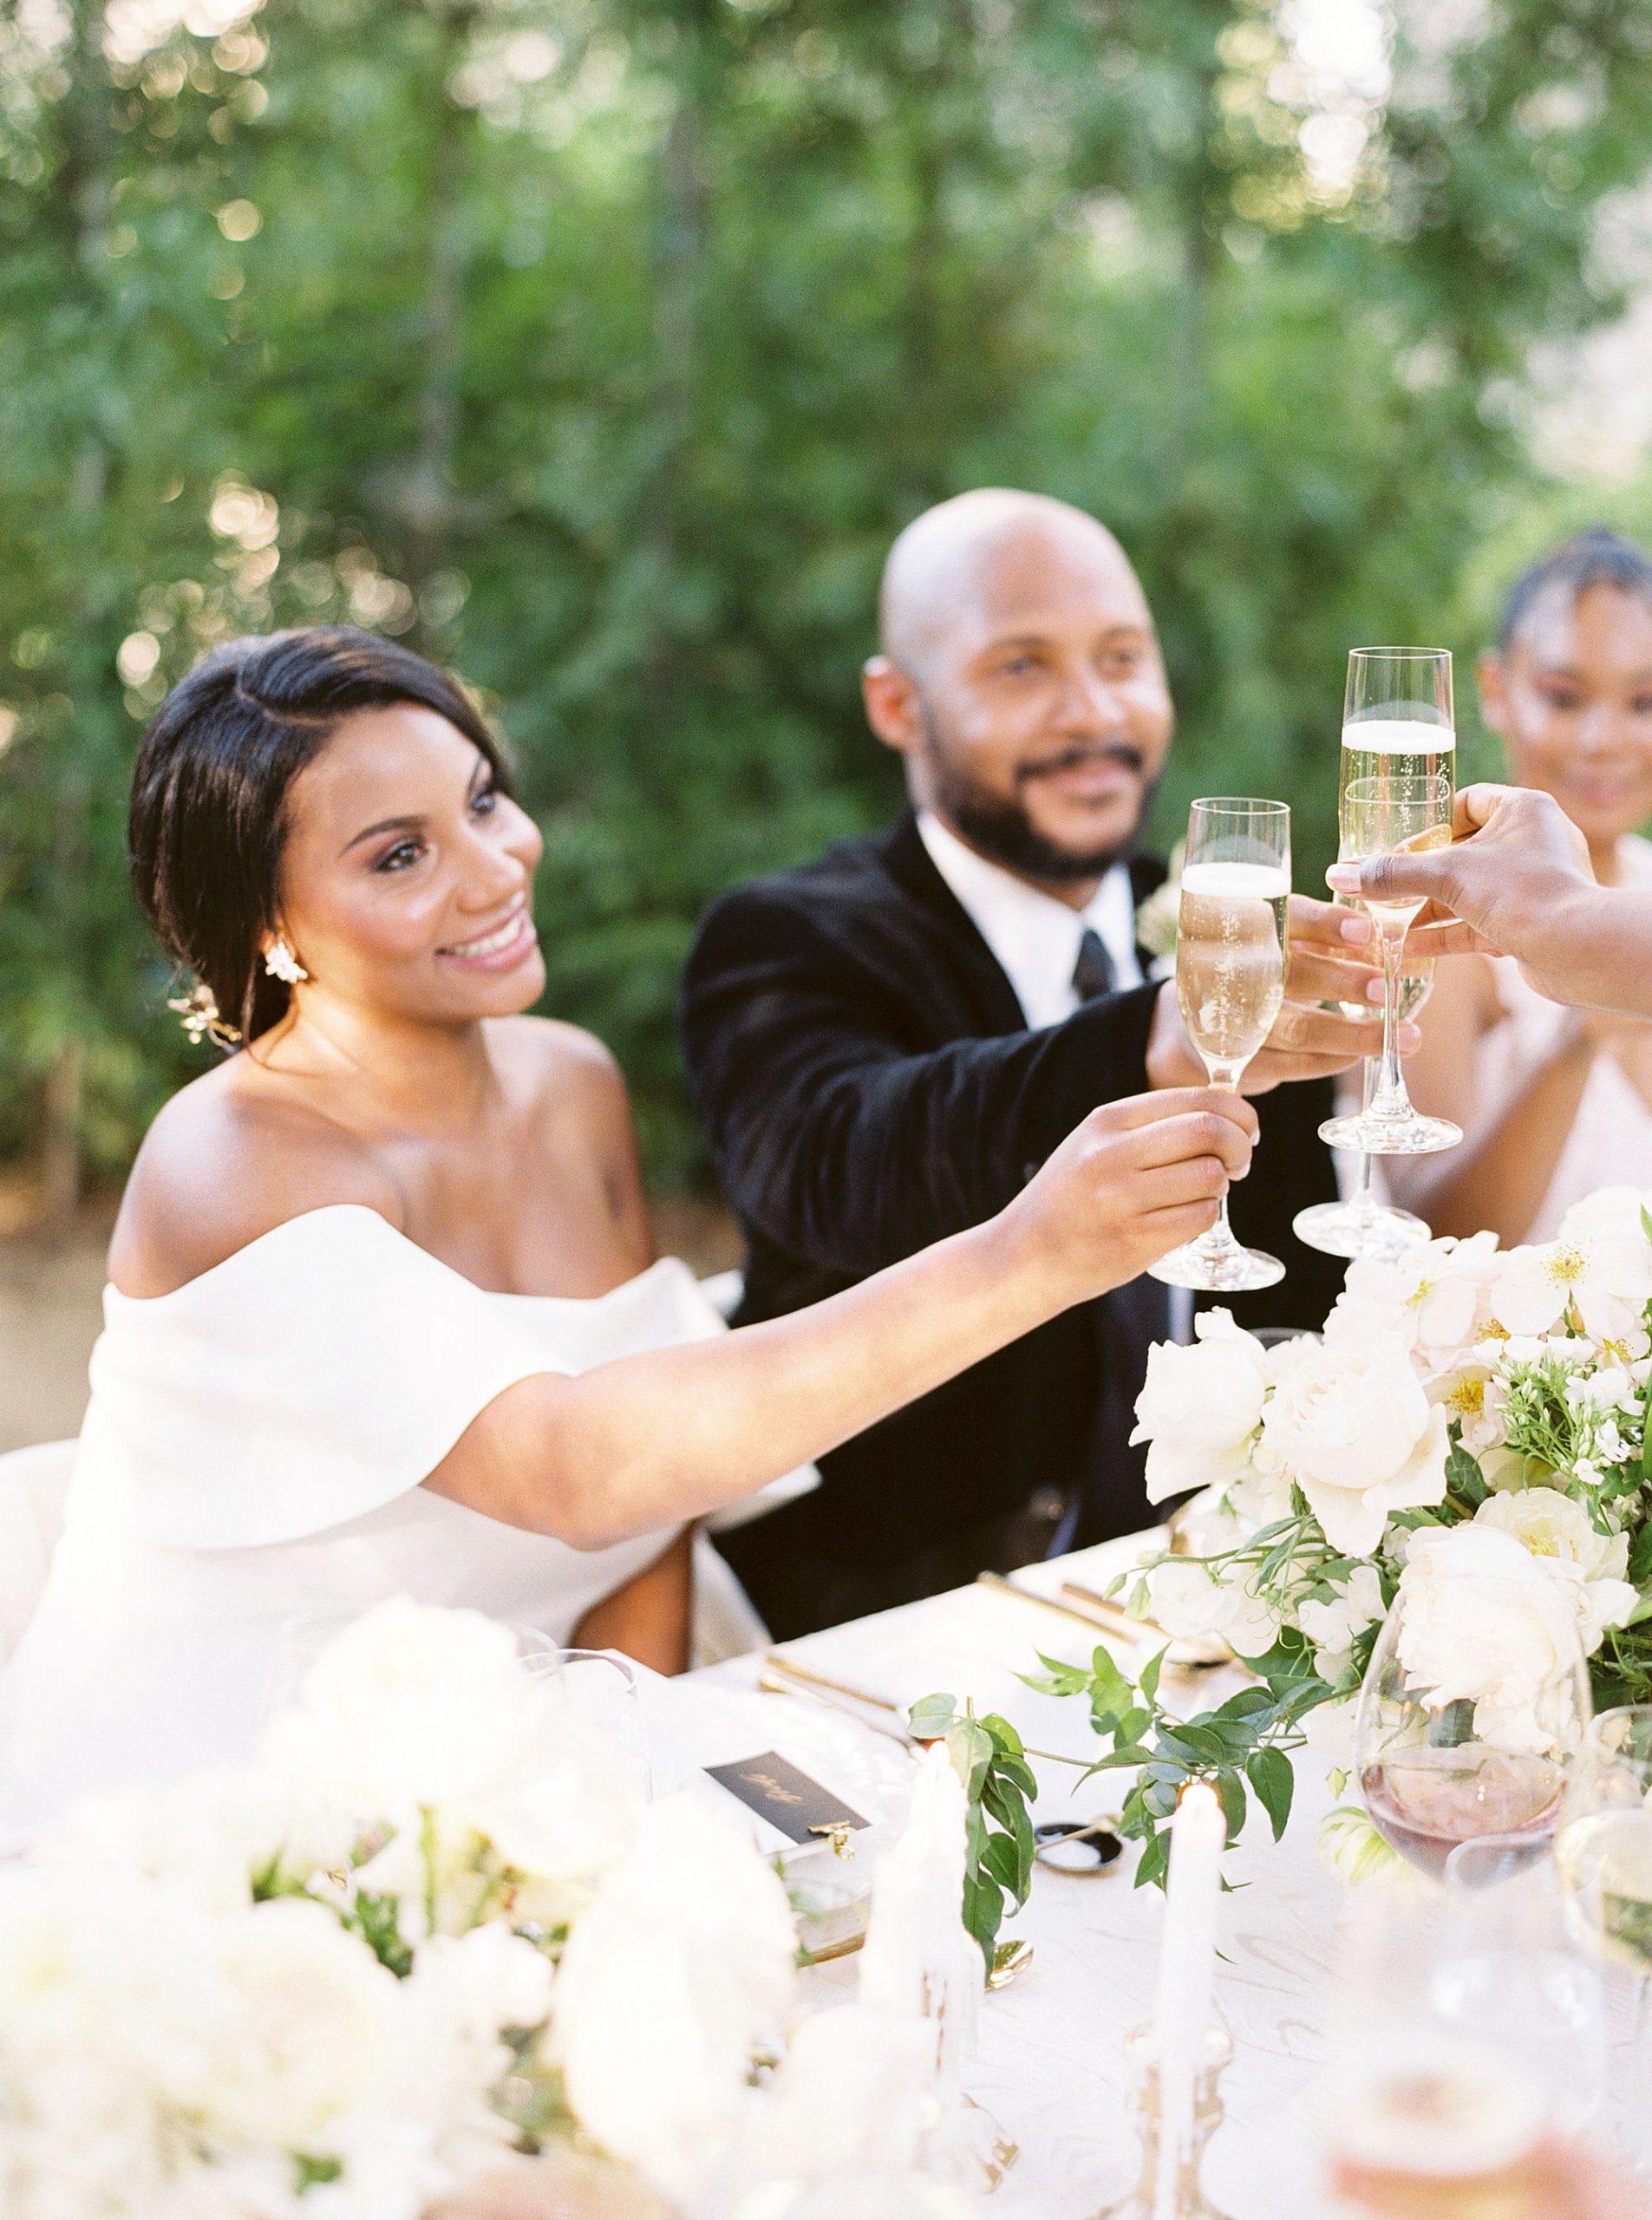 Park Winters Micro-Wedding Inspiration on Style Me Pretty - Stephanie Teague Events - Ashley Baumgartner - Park Winters Wedding - Black Tie Wedding - Micro-Wedding Sacramento Photographer_0034.jpg